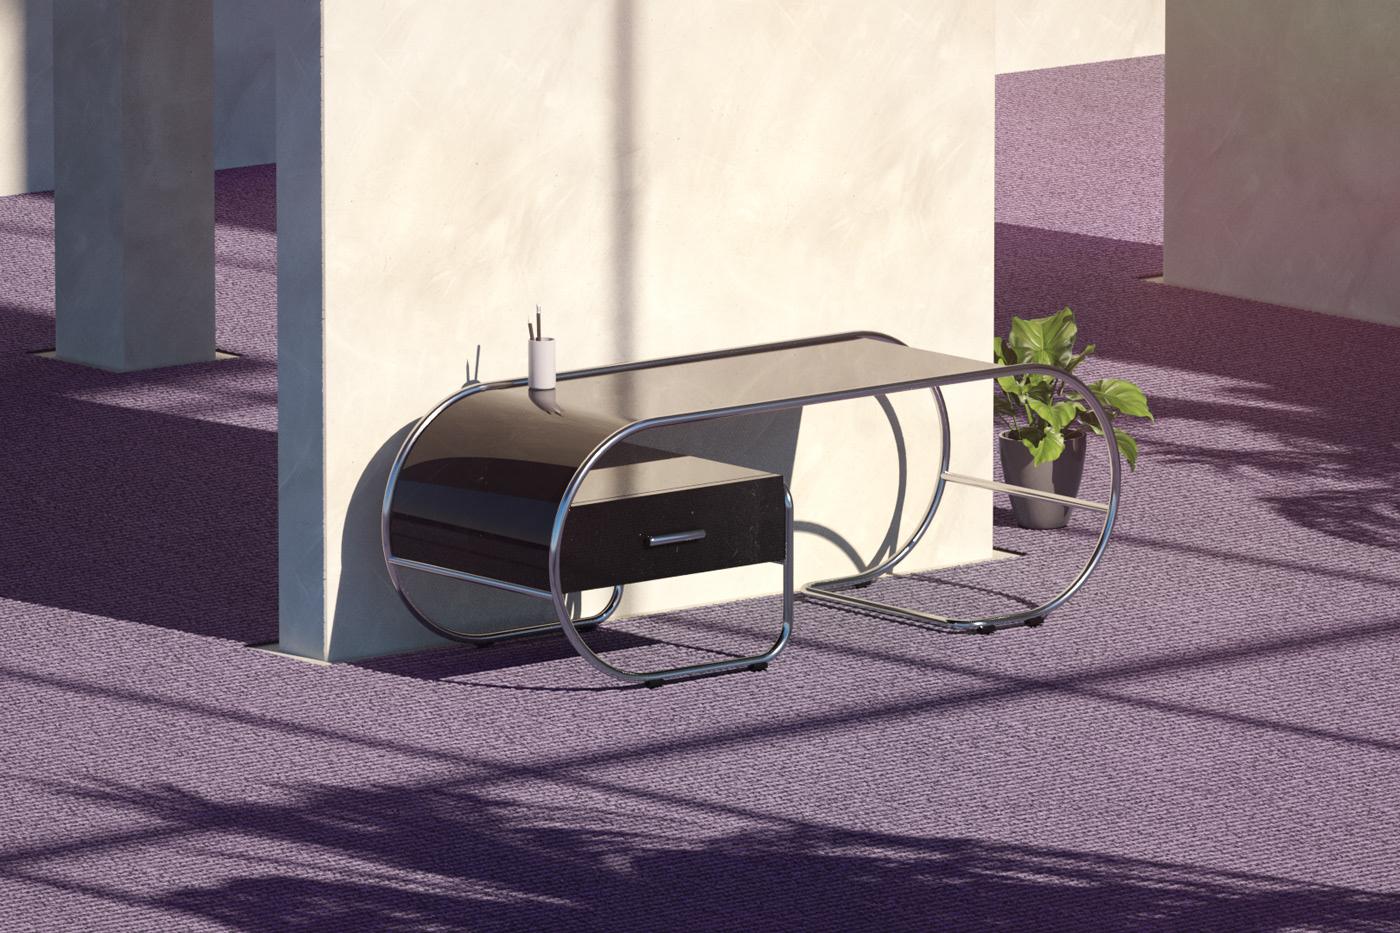 Furniture Design Inspired by Adobe Hidden Treasures